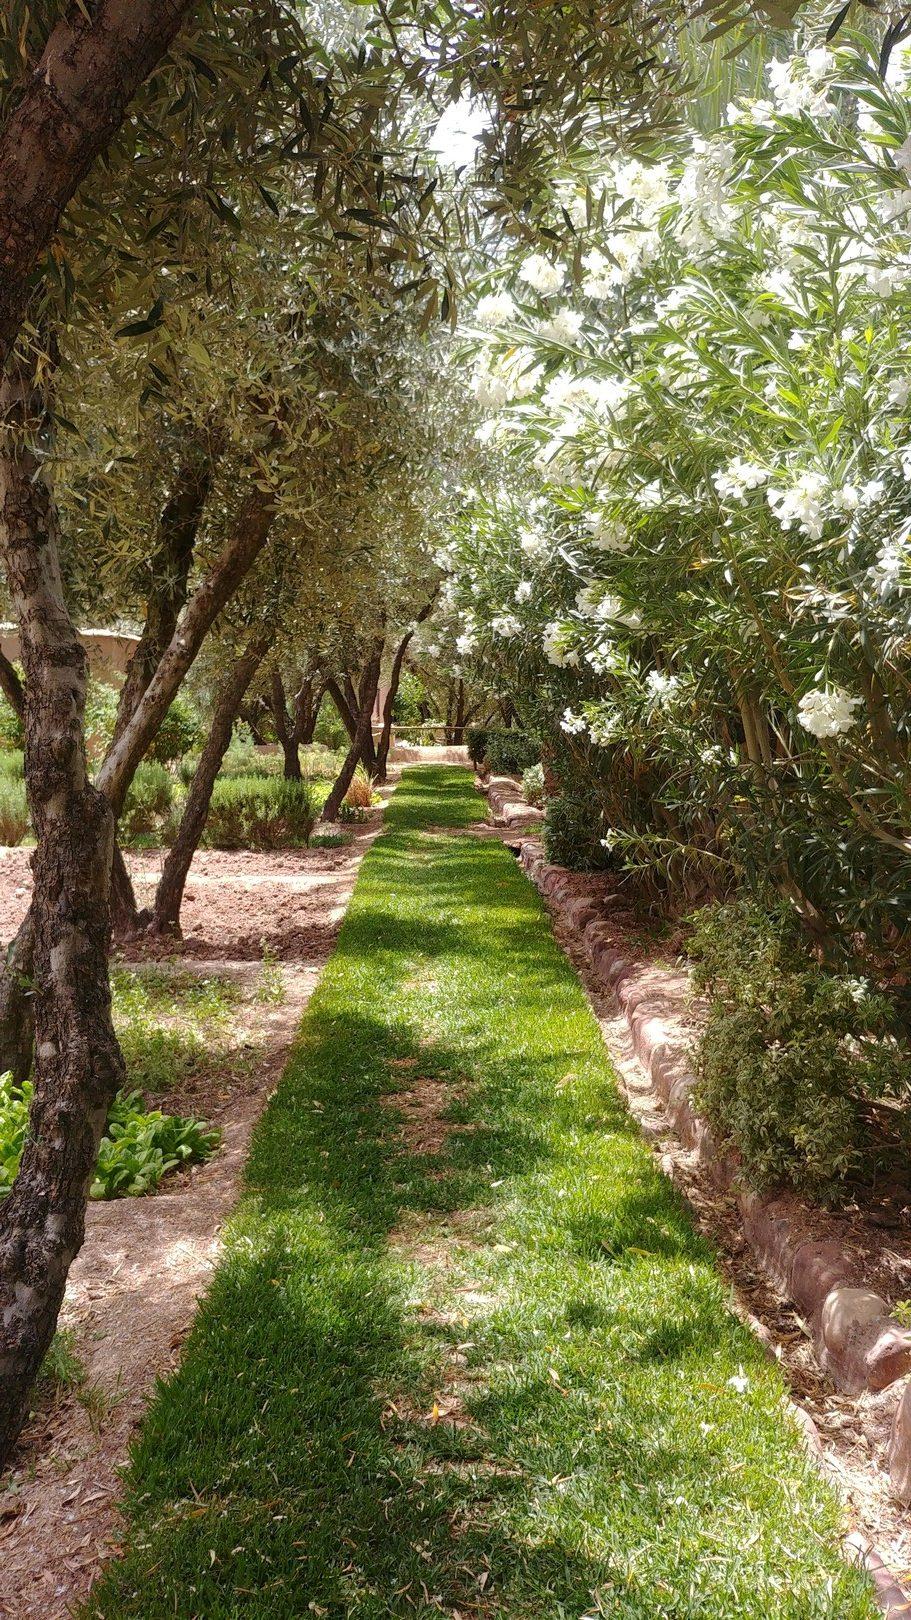 Maroc - Le jardin du Dar Ahlam